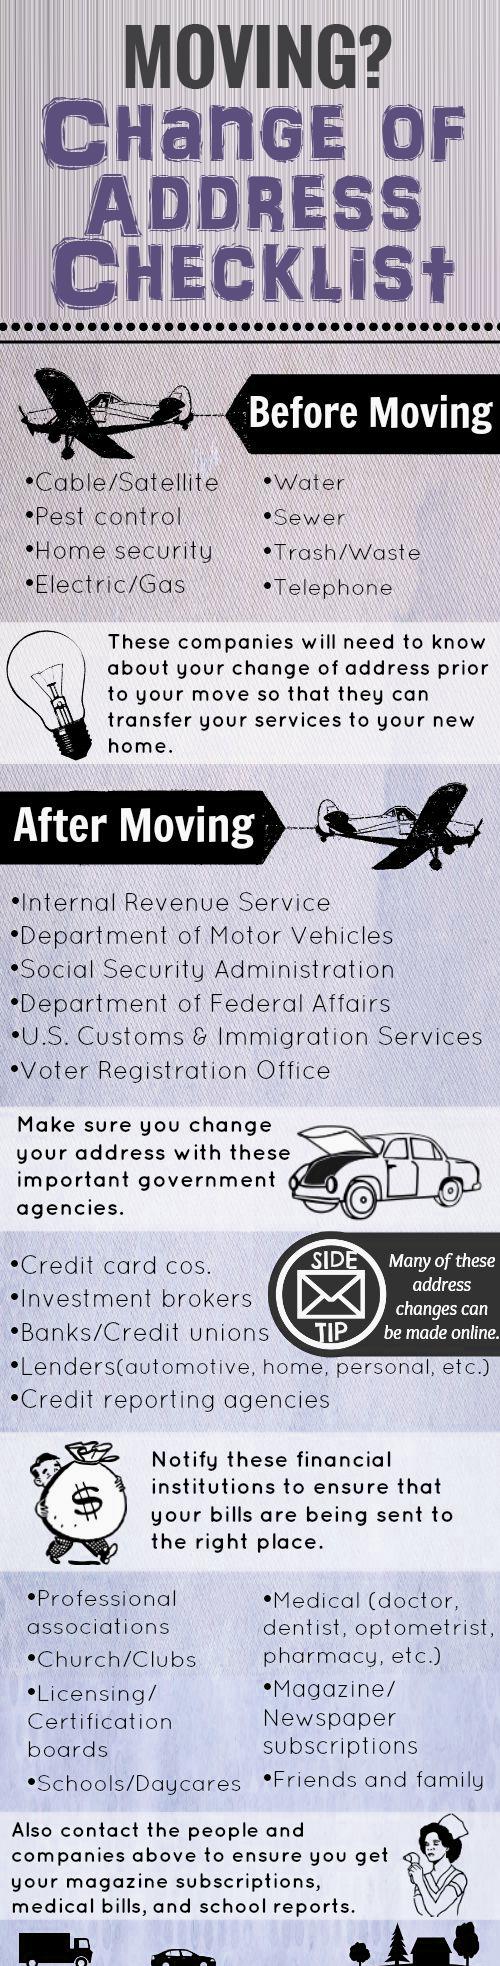 Moving-Change-of-Address-Checklist-infographic Moving? Change of Address Checklist Orlando | Central Florida